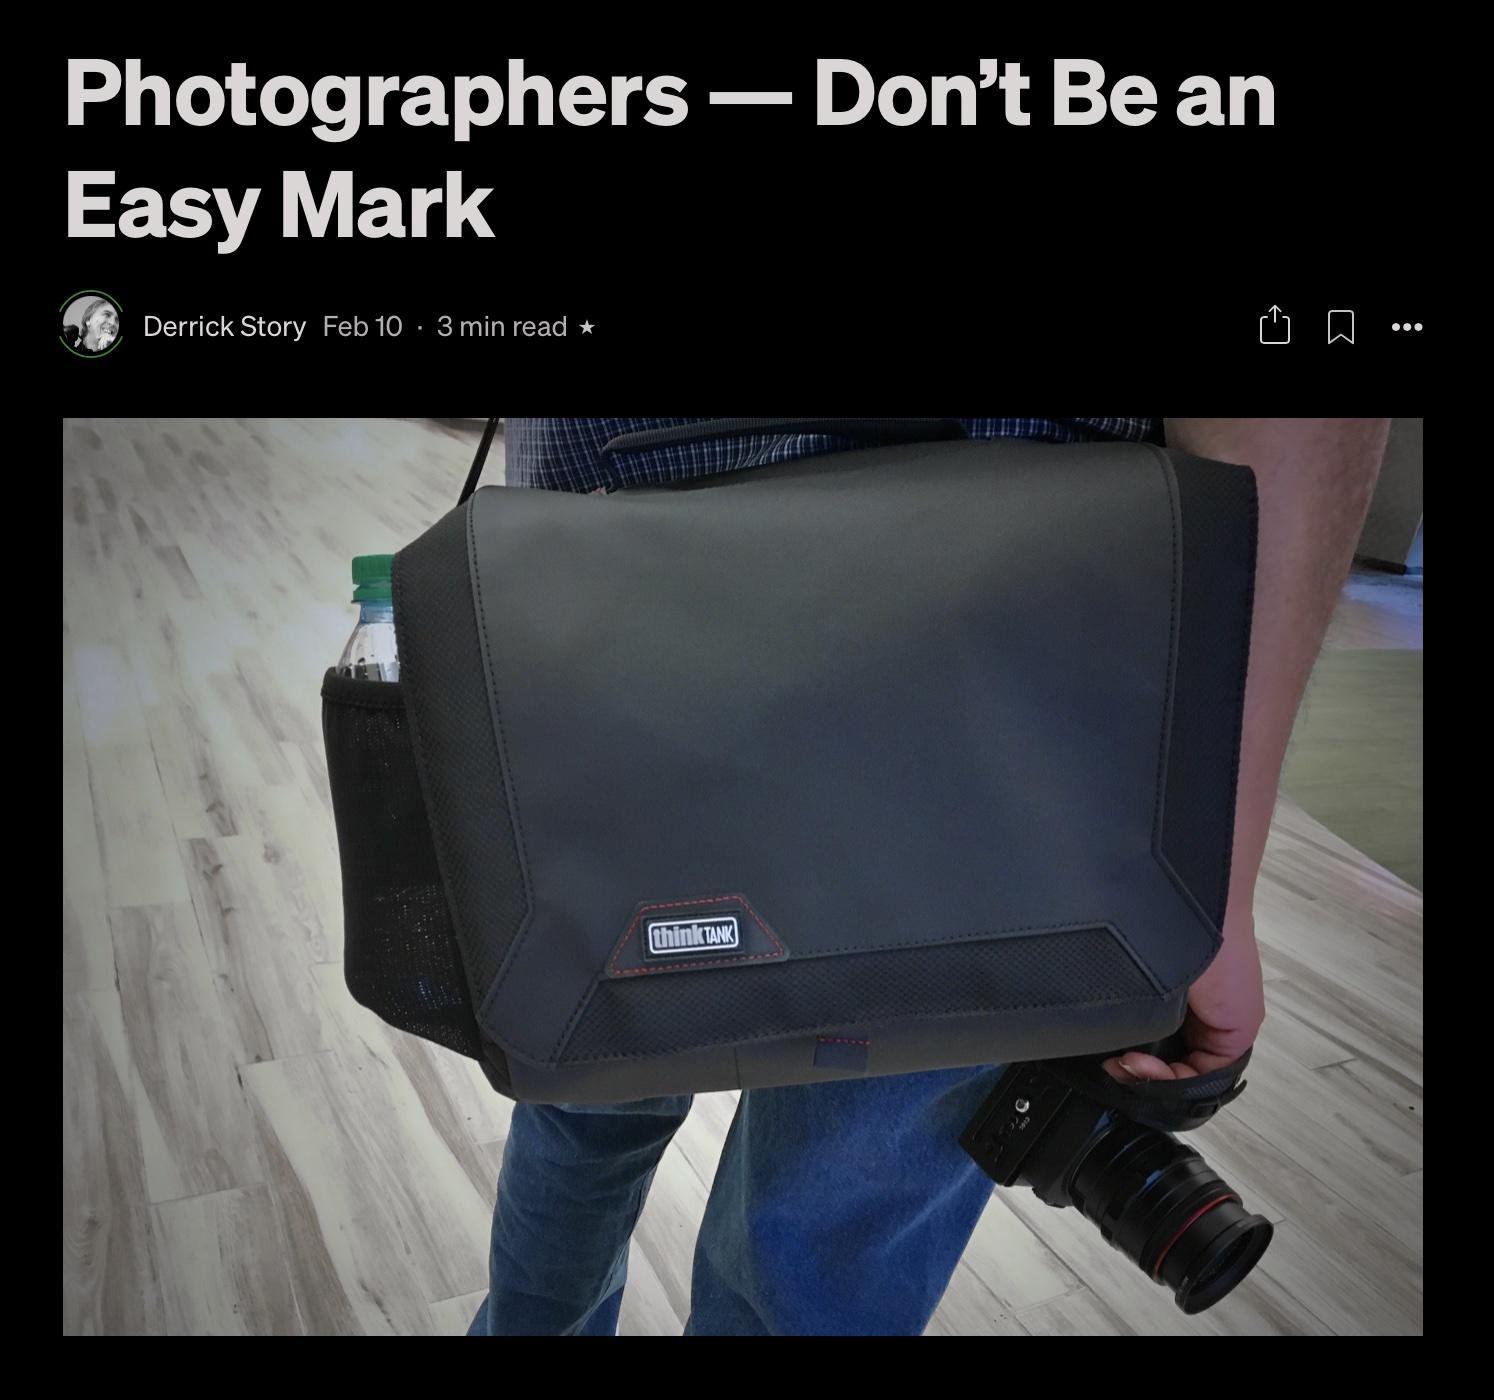 https://thedigitalstory.com/2021/06/no-easy-mark.jpg